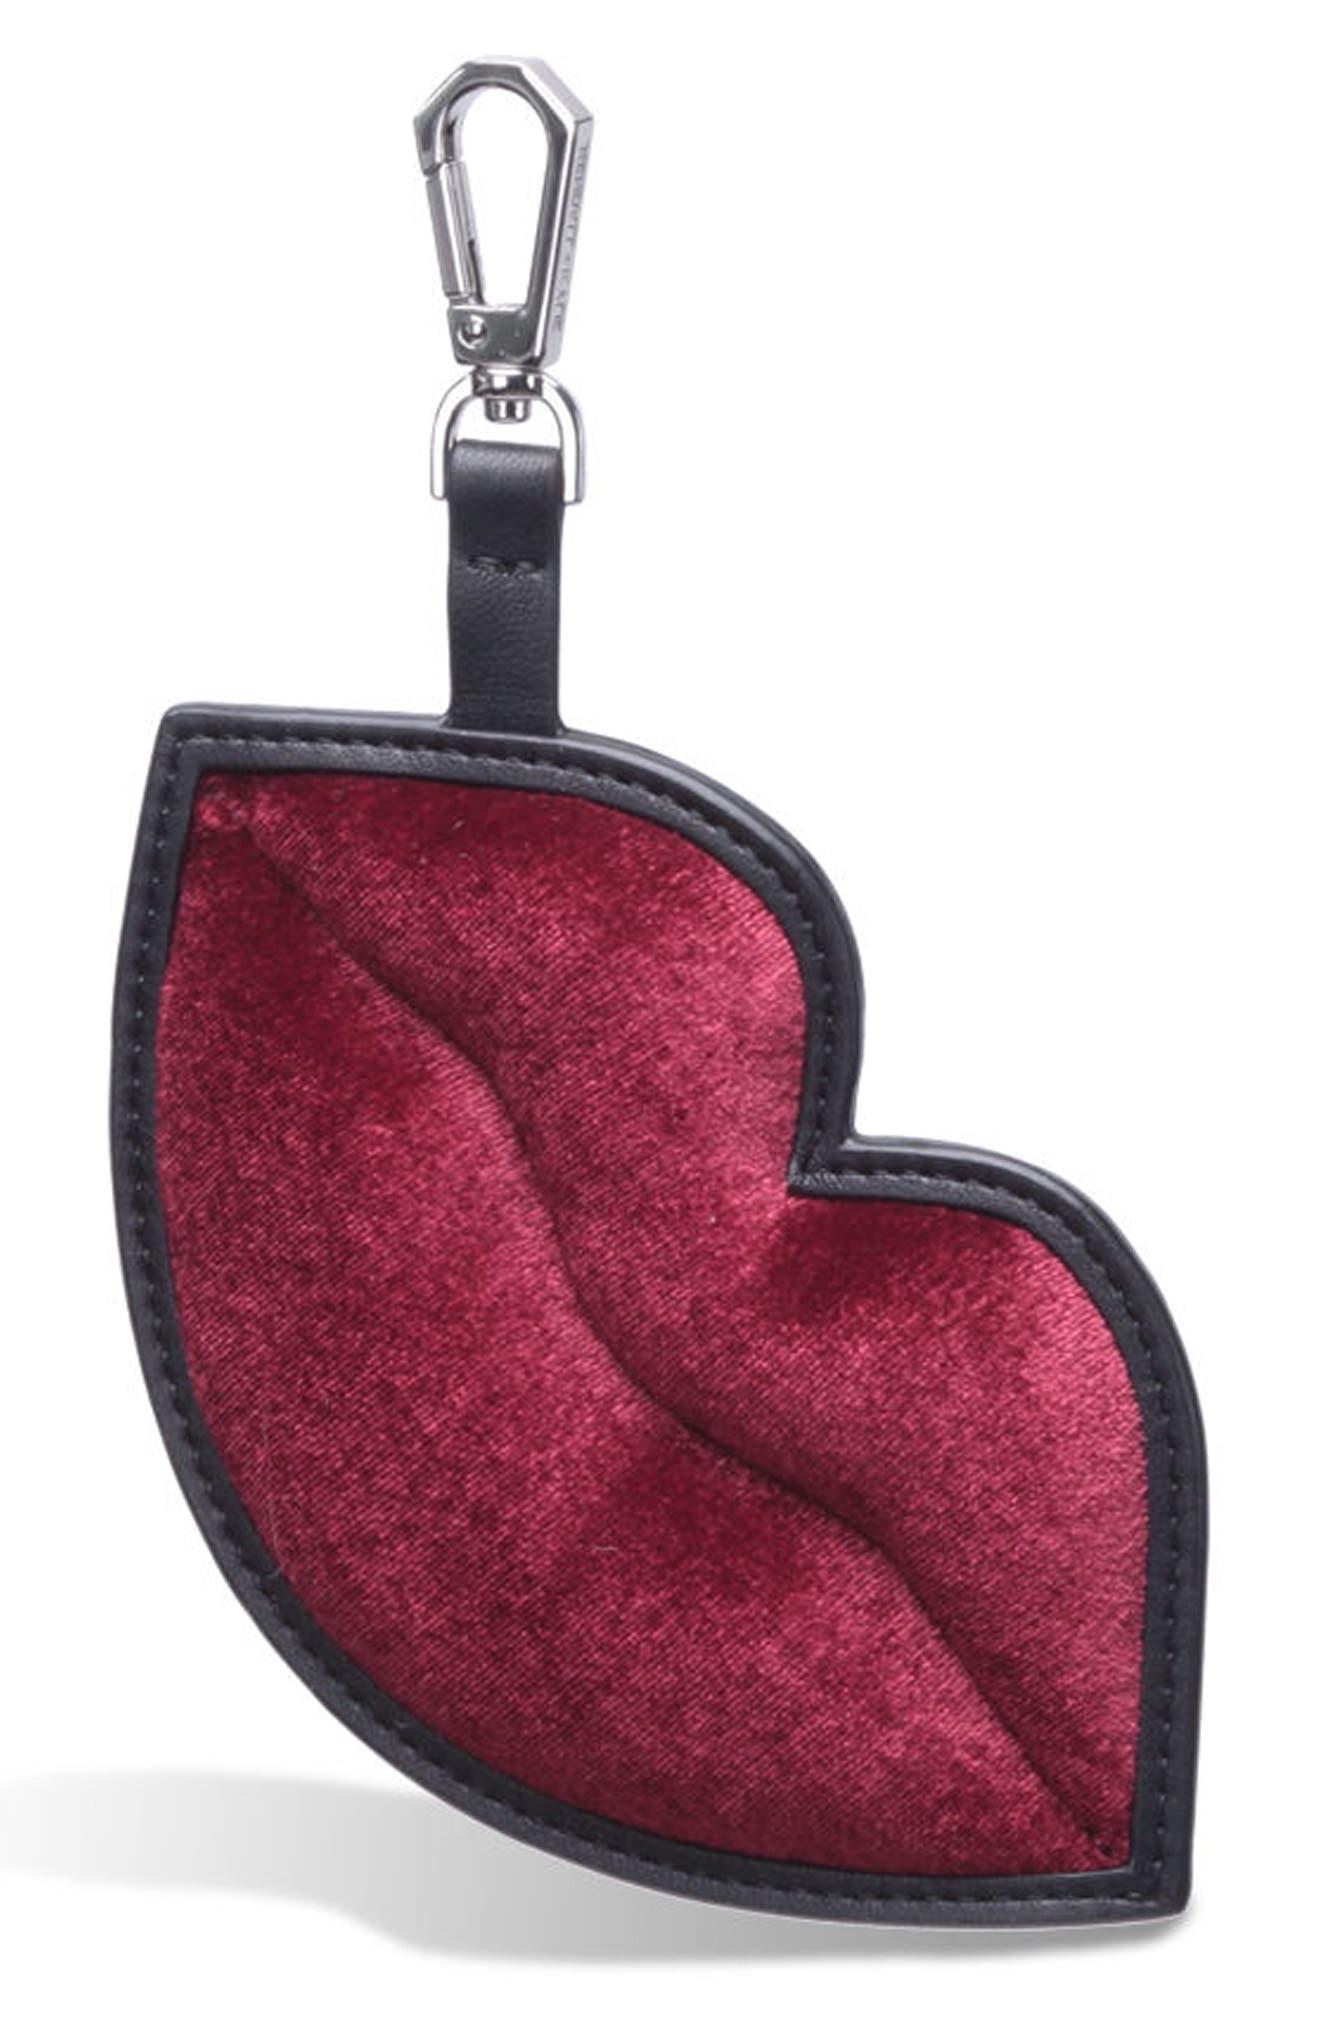 KENDALL + KYLIE Lush Lips Bag Charm